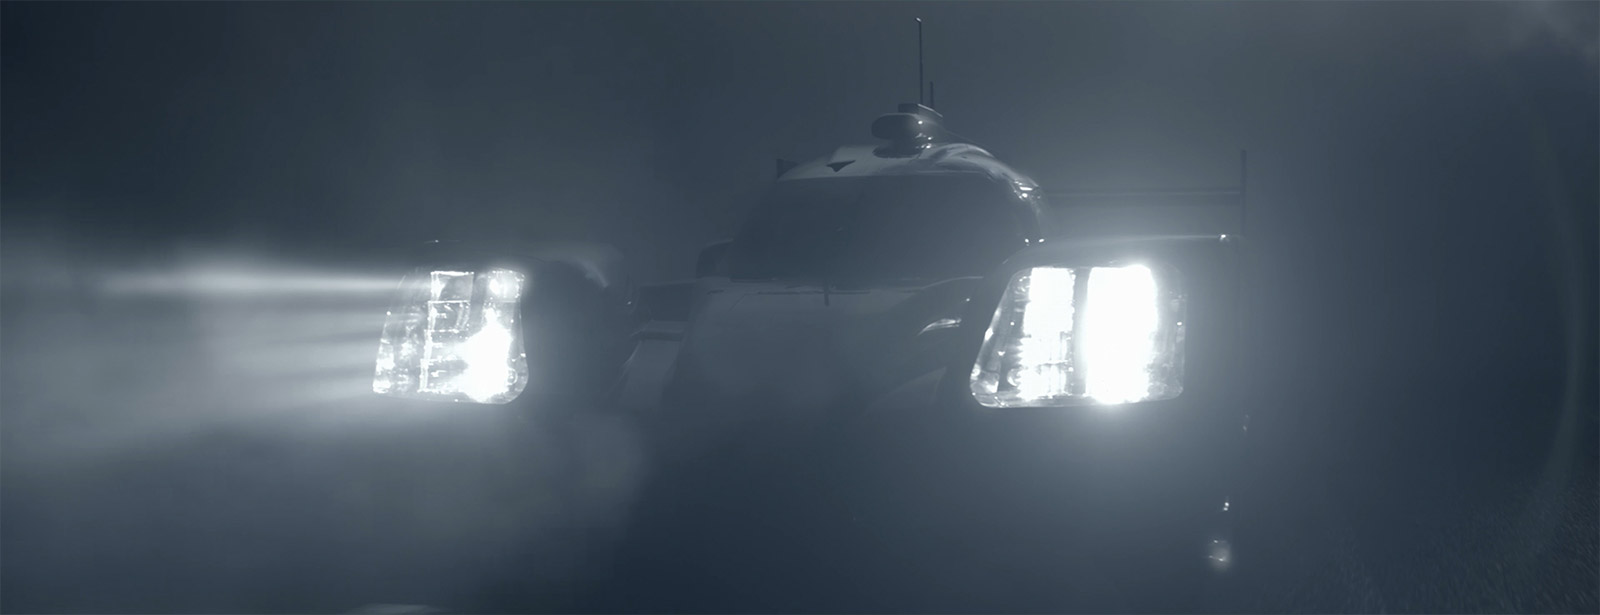 Porsche - モータースポーツ